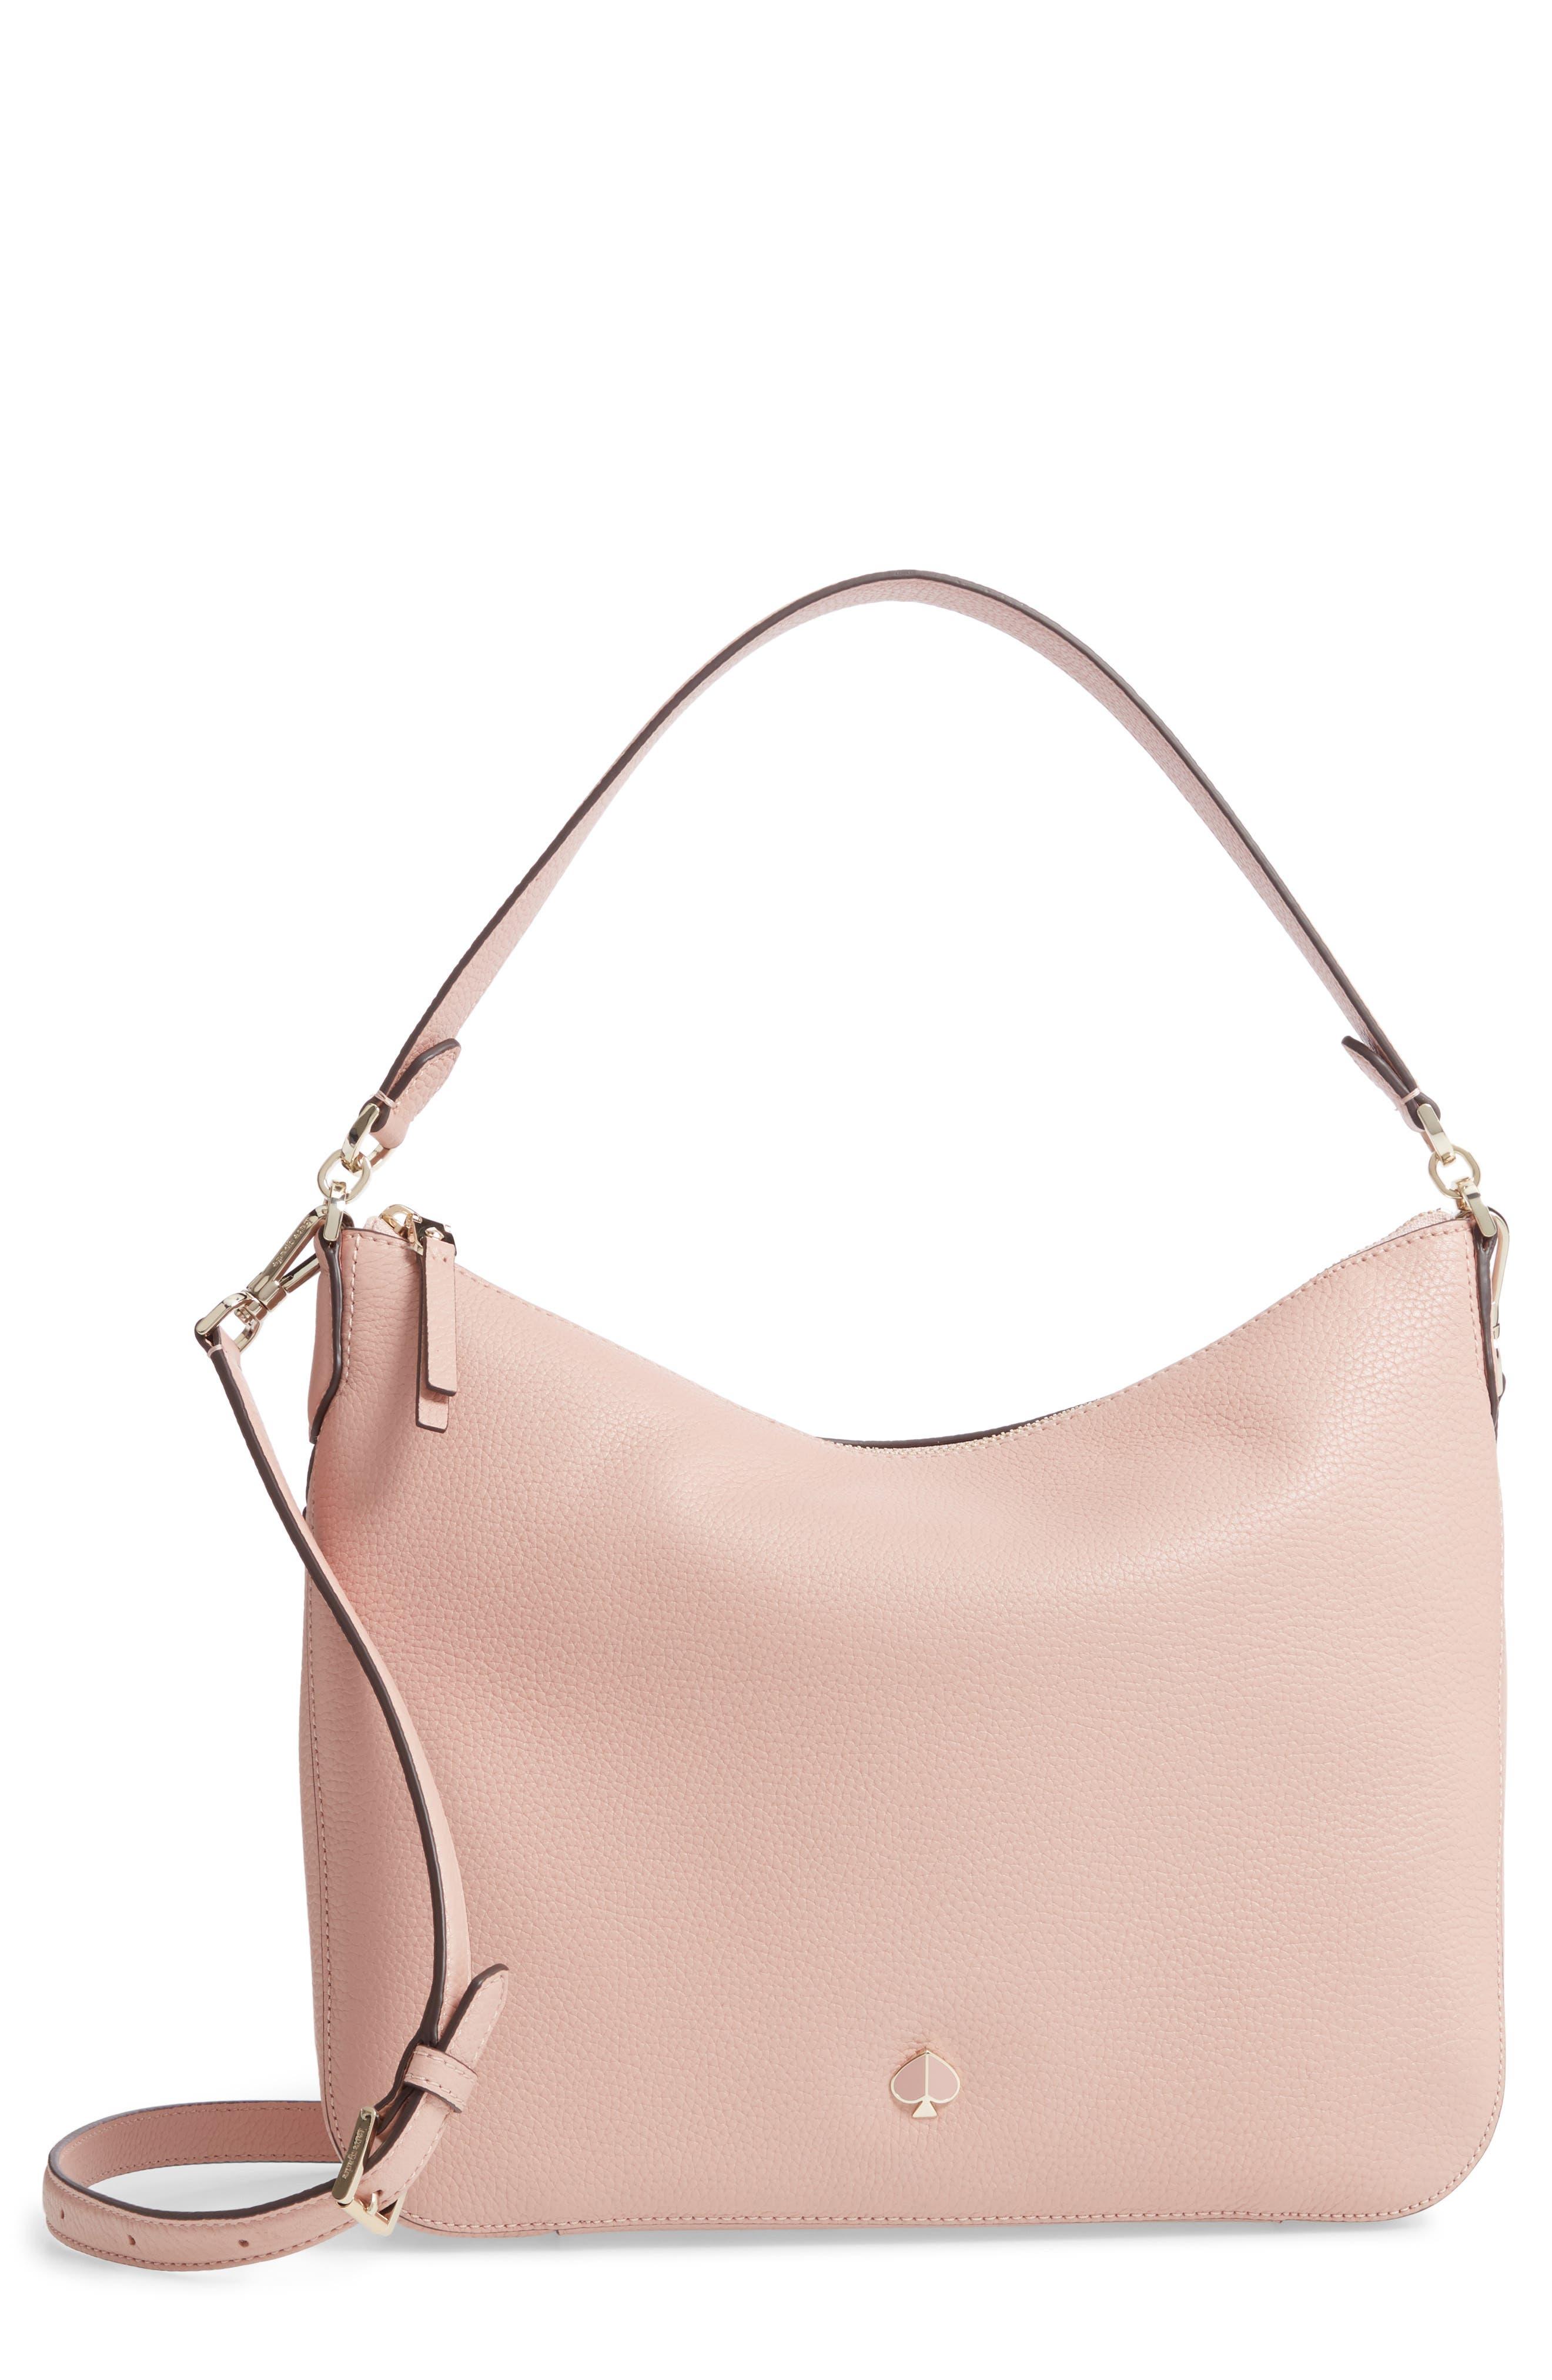 KATE SPADE NEW YORK, medium polly leather shoulder bag, Main thumbnail 1, color, FLAPPER PINK